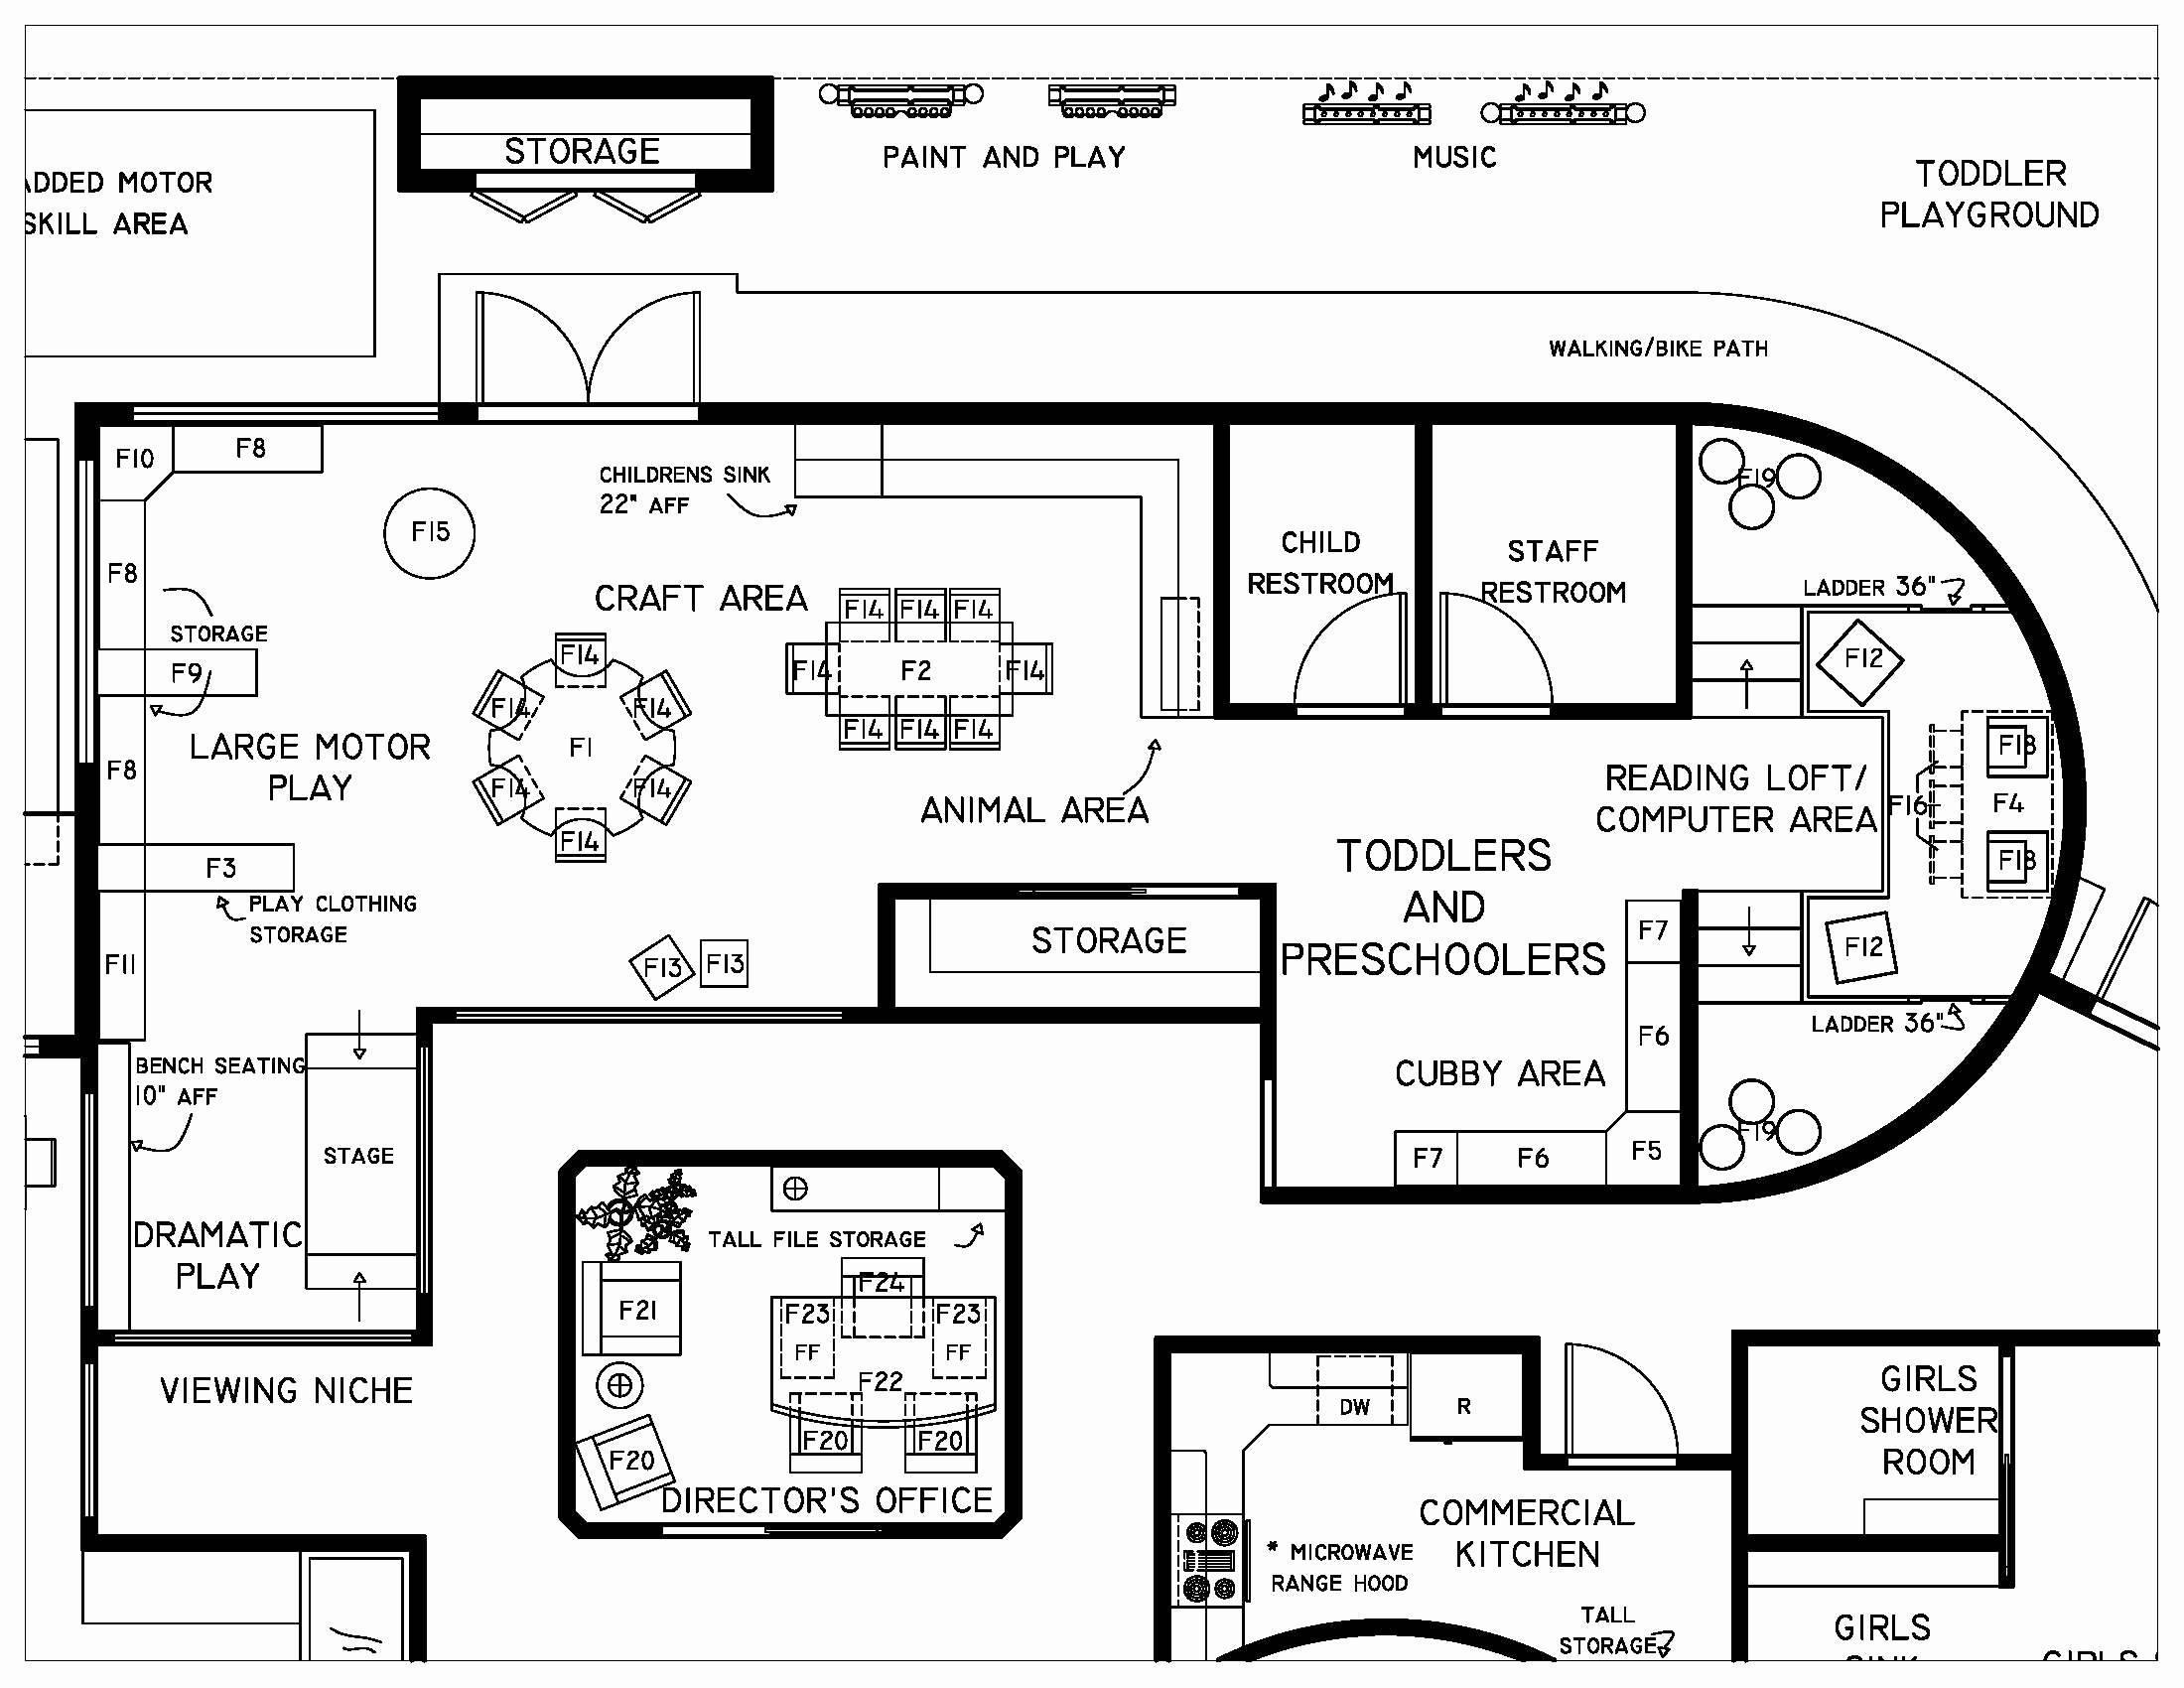 Car Engine Diagram for Kids Draw A Plan Your House Elegant Floor Plan Mansion Floor Plan Of Car Engine Diagram for Kids